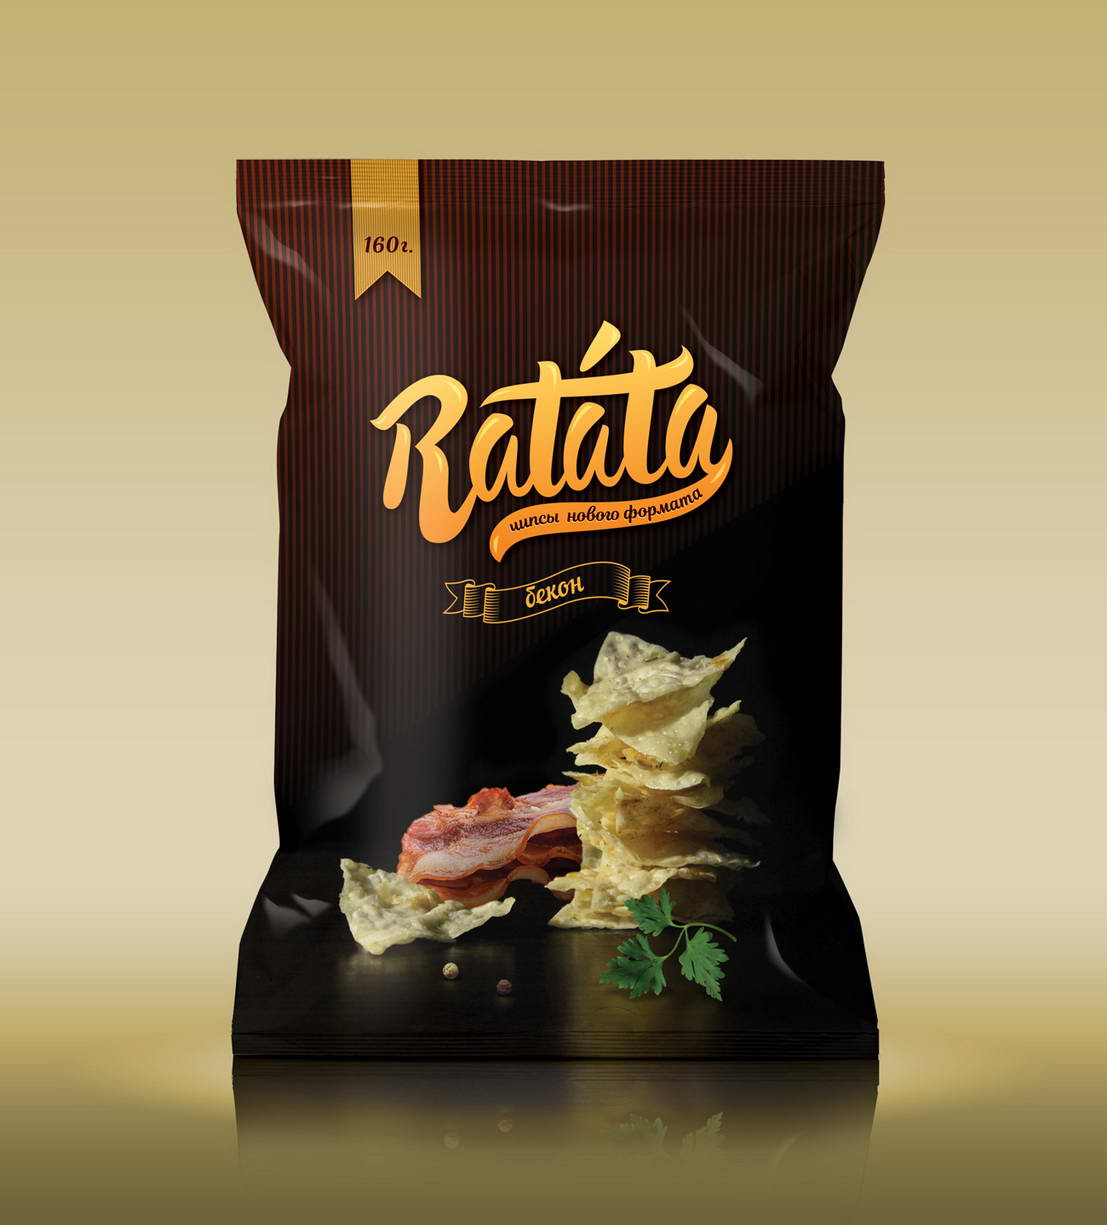 emballage design chips med bacon Ratata